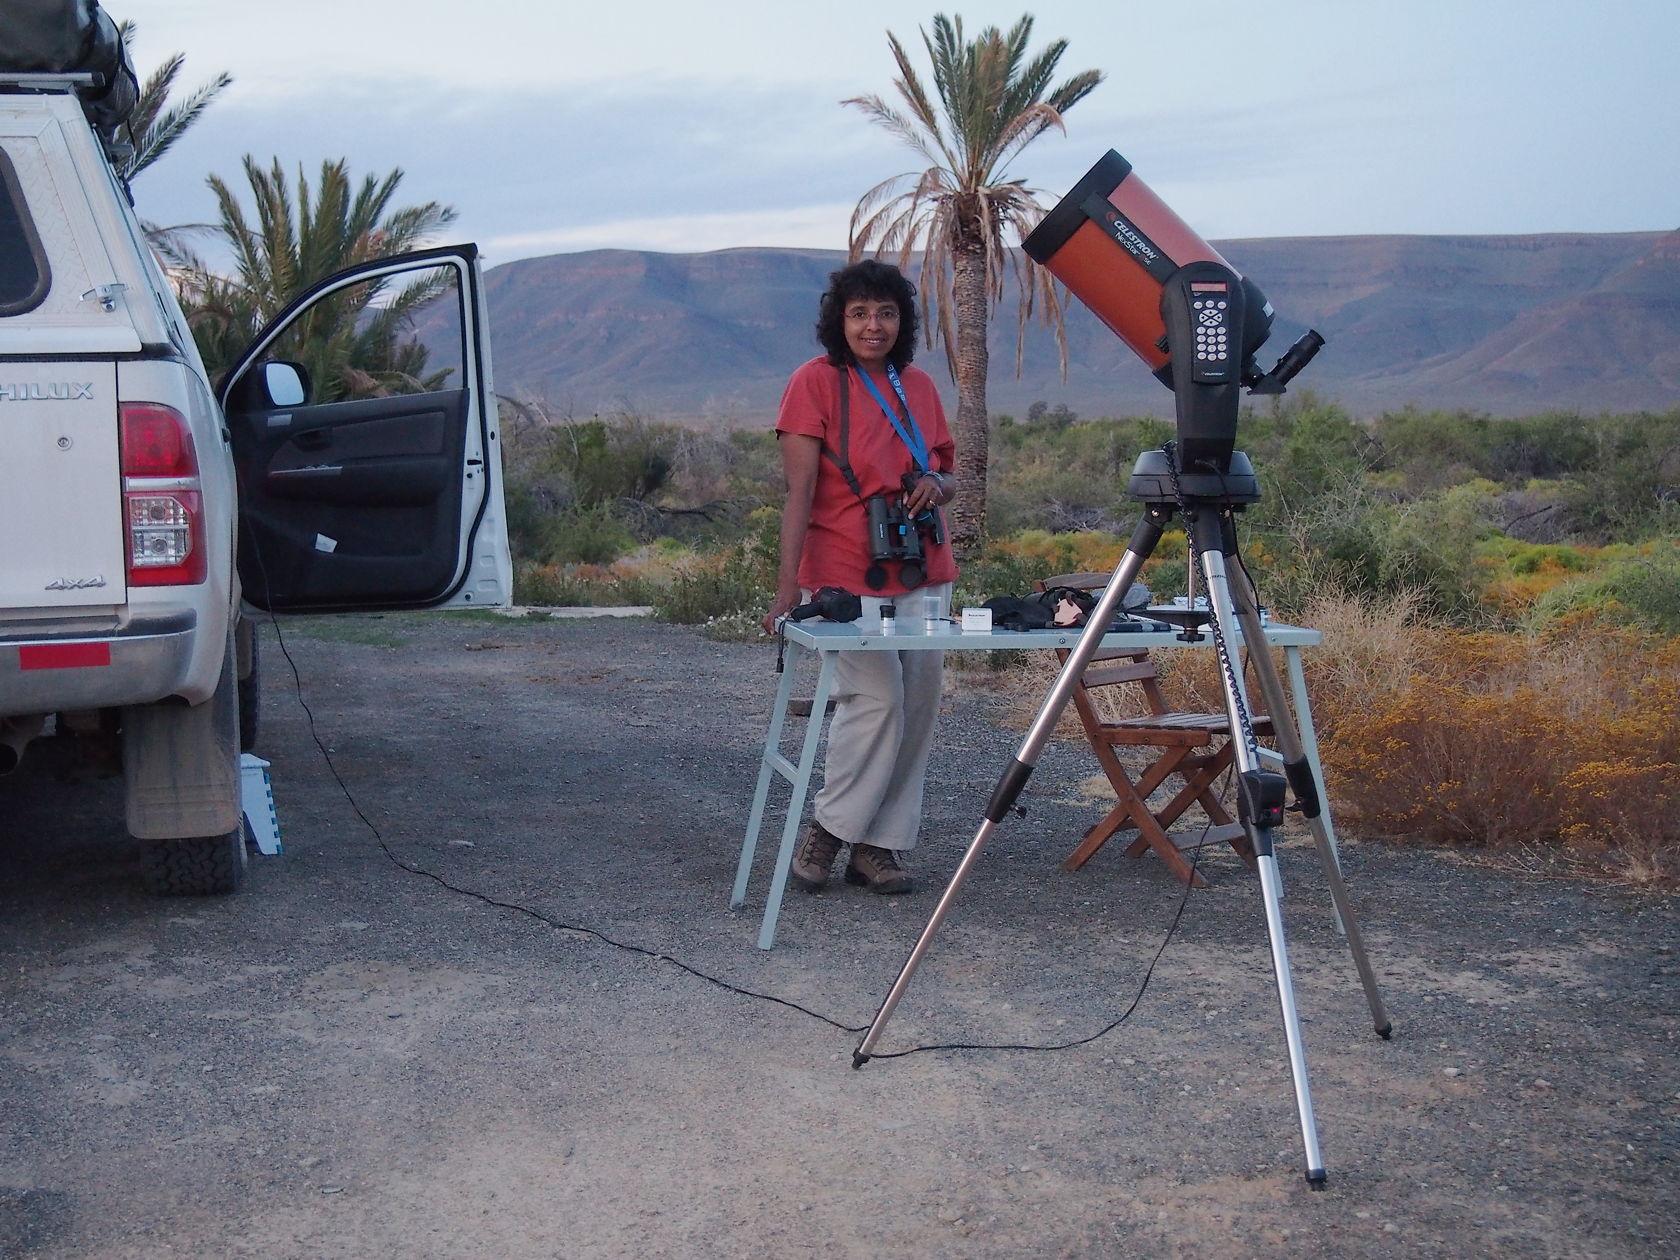 Celestron Nextstar 8 SE telescope at Cottage 1, Tankwa Karoo National Park, South Africa